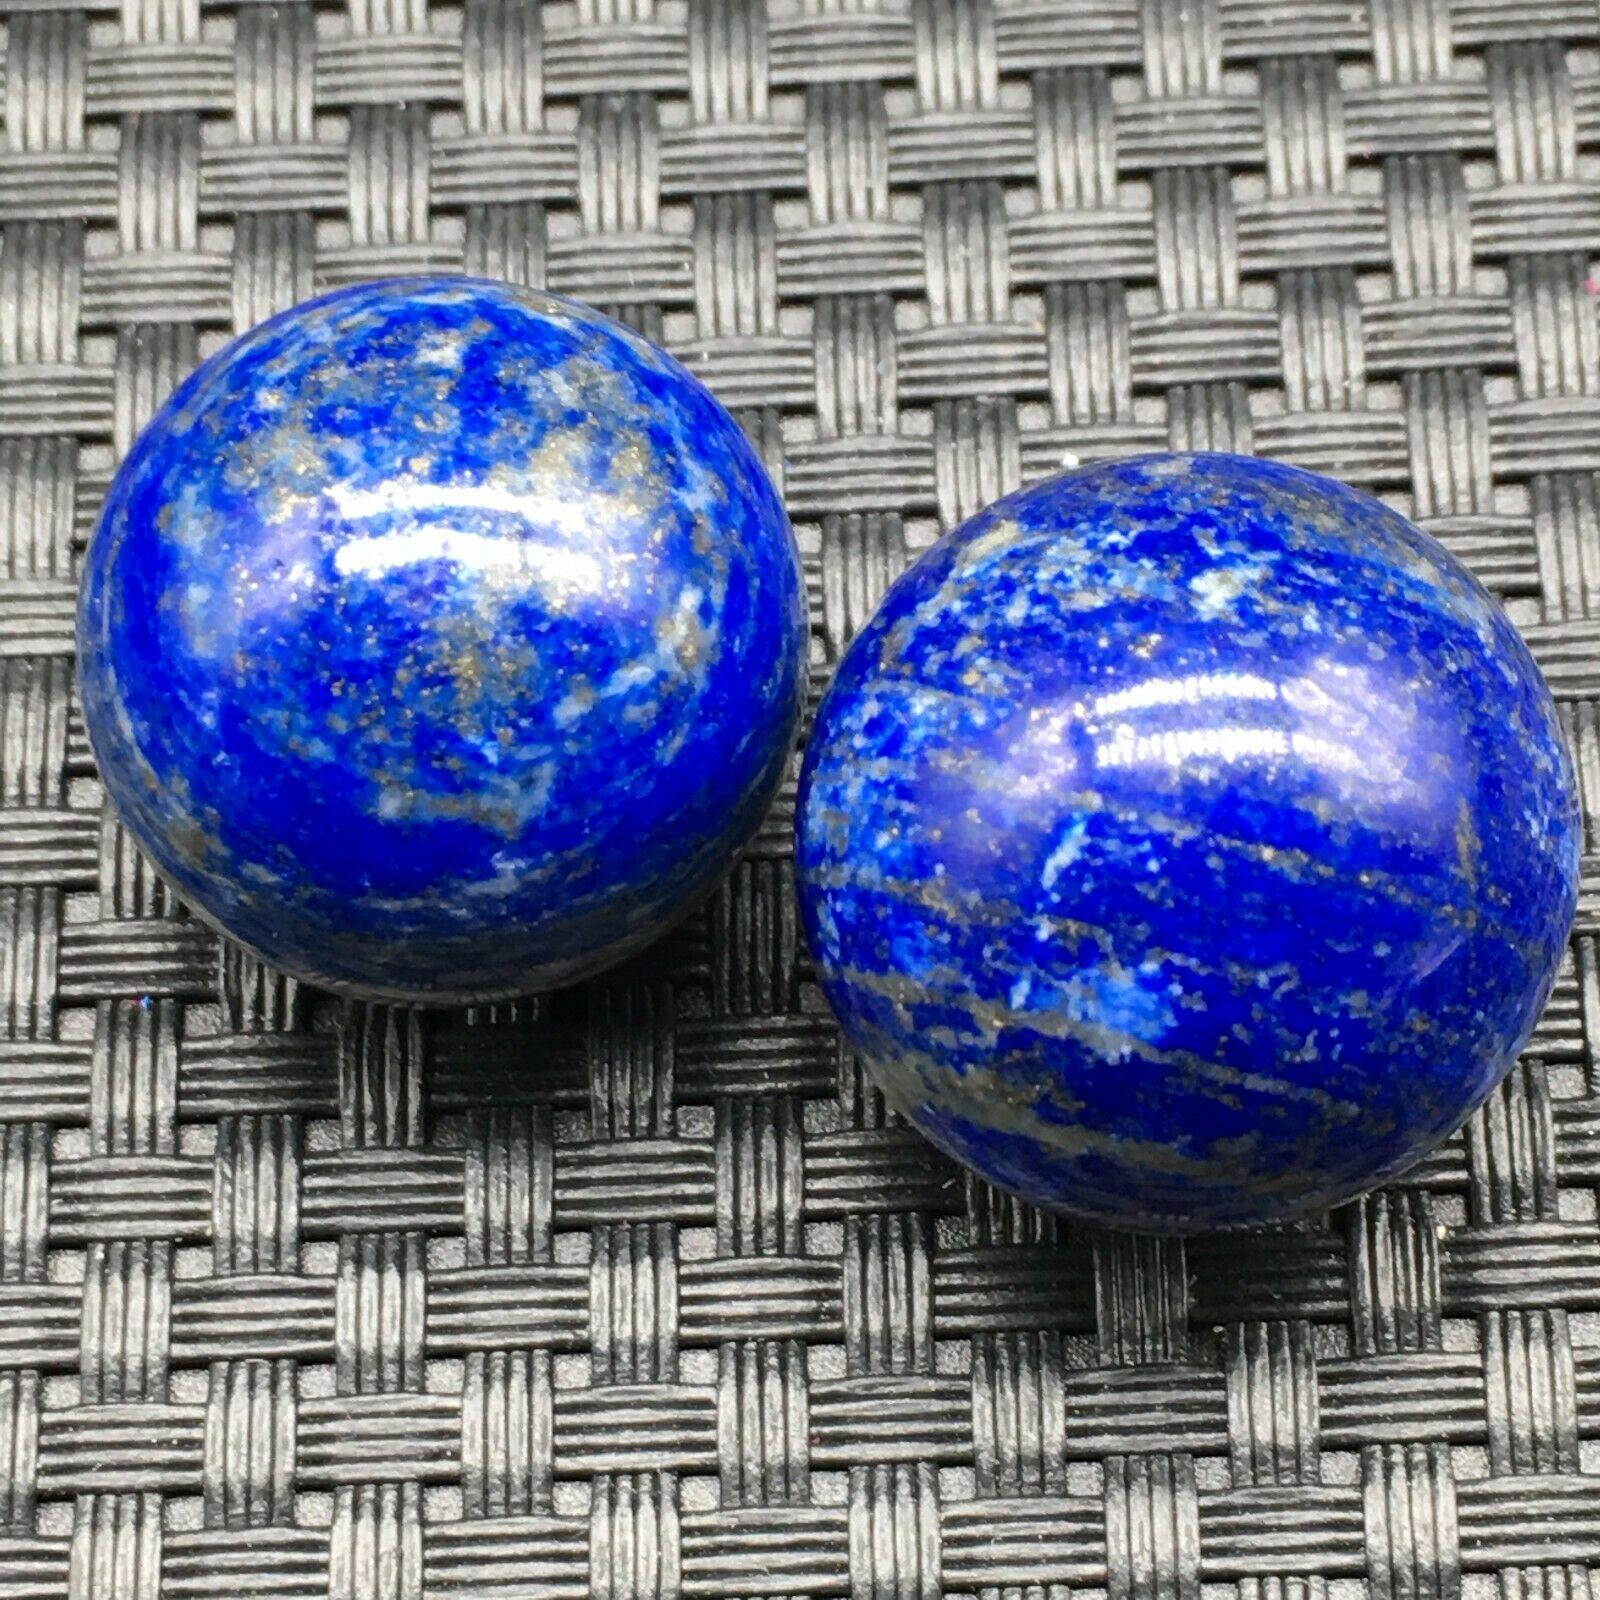 Lapislázuli-bolas de cristal naturales y minerales, Gema natural de cristal, reiki, feng...